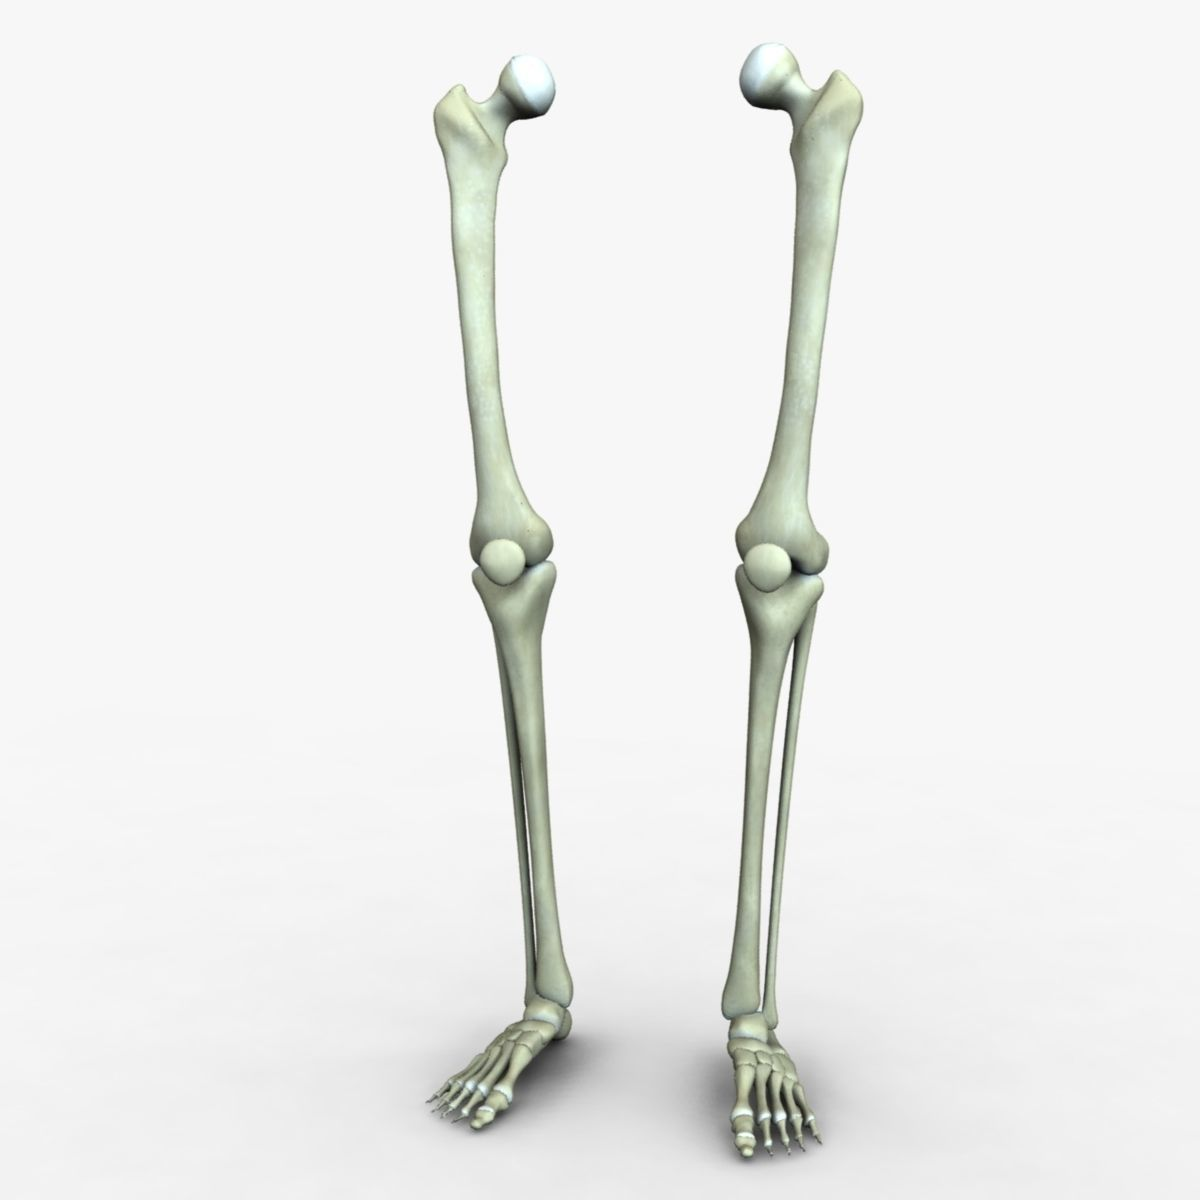 3d Human Leg Bones Accurate Cgtrader